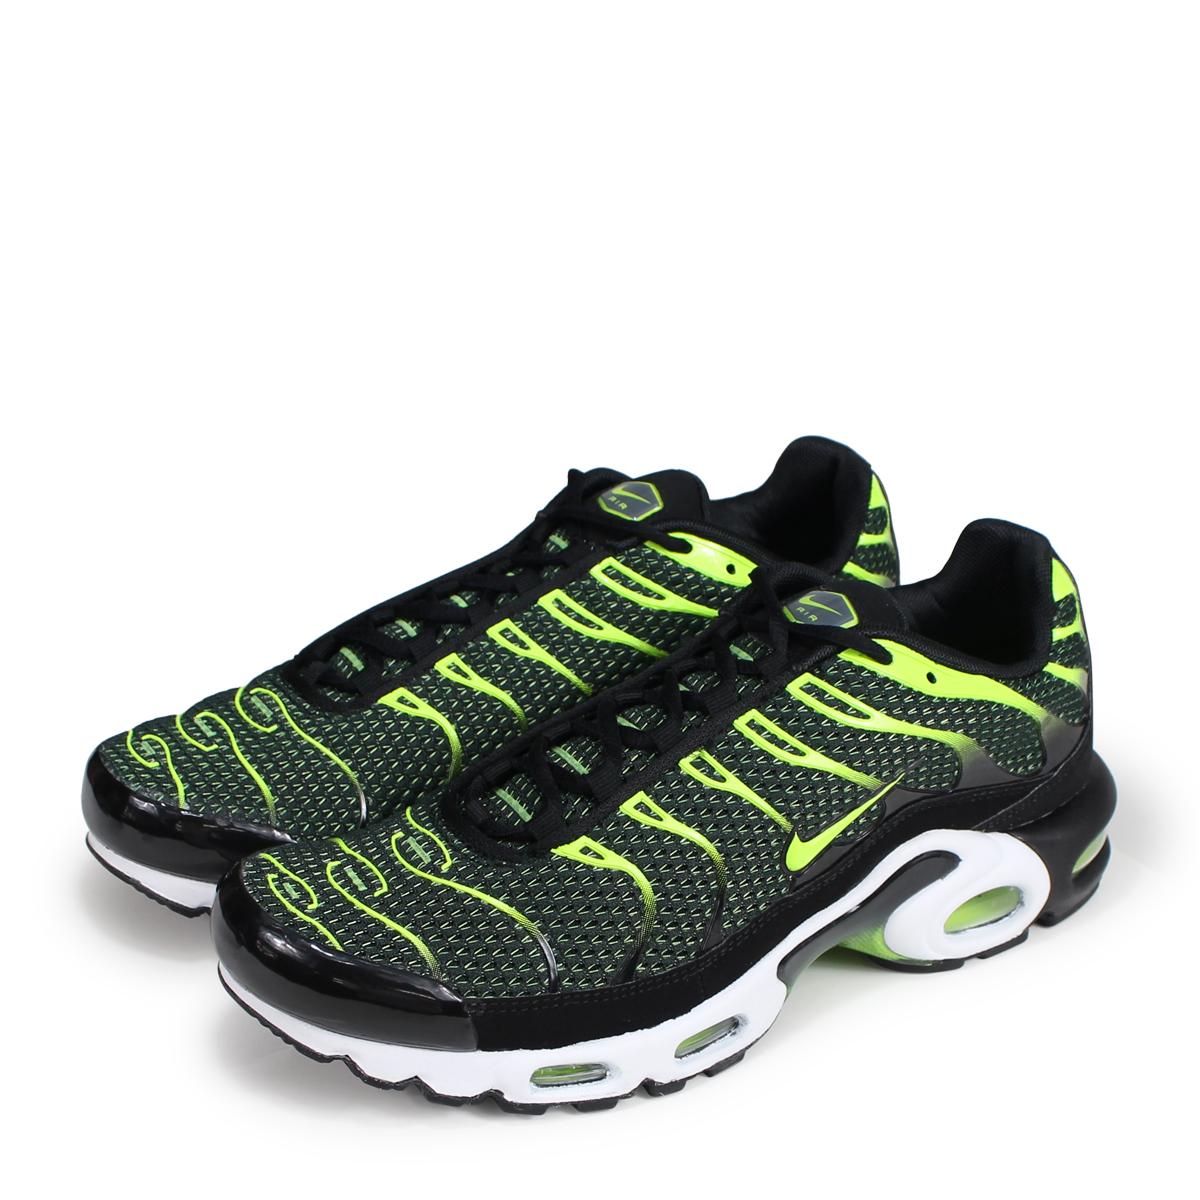 a757891600 NIKE AIR MAX PLUS Kie Ney AMAX plus sneakers men 852,630-036 black  [reservation ...